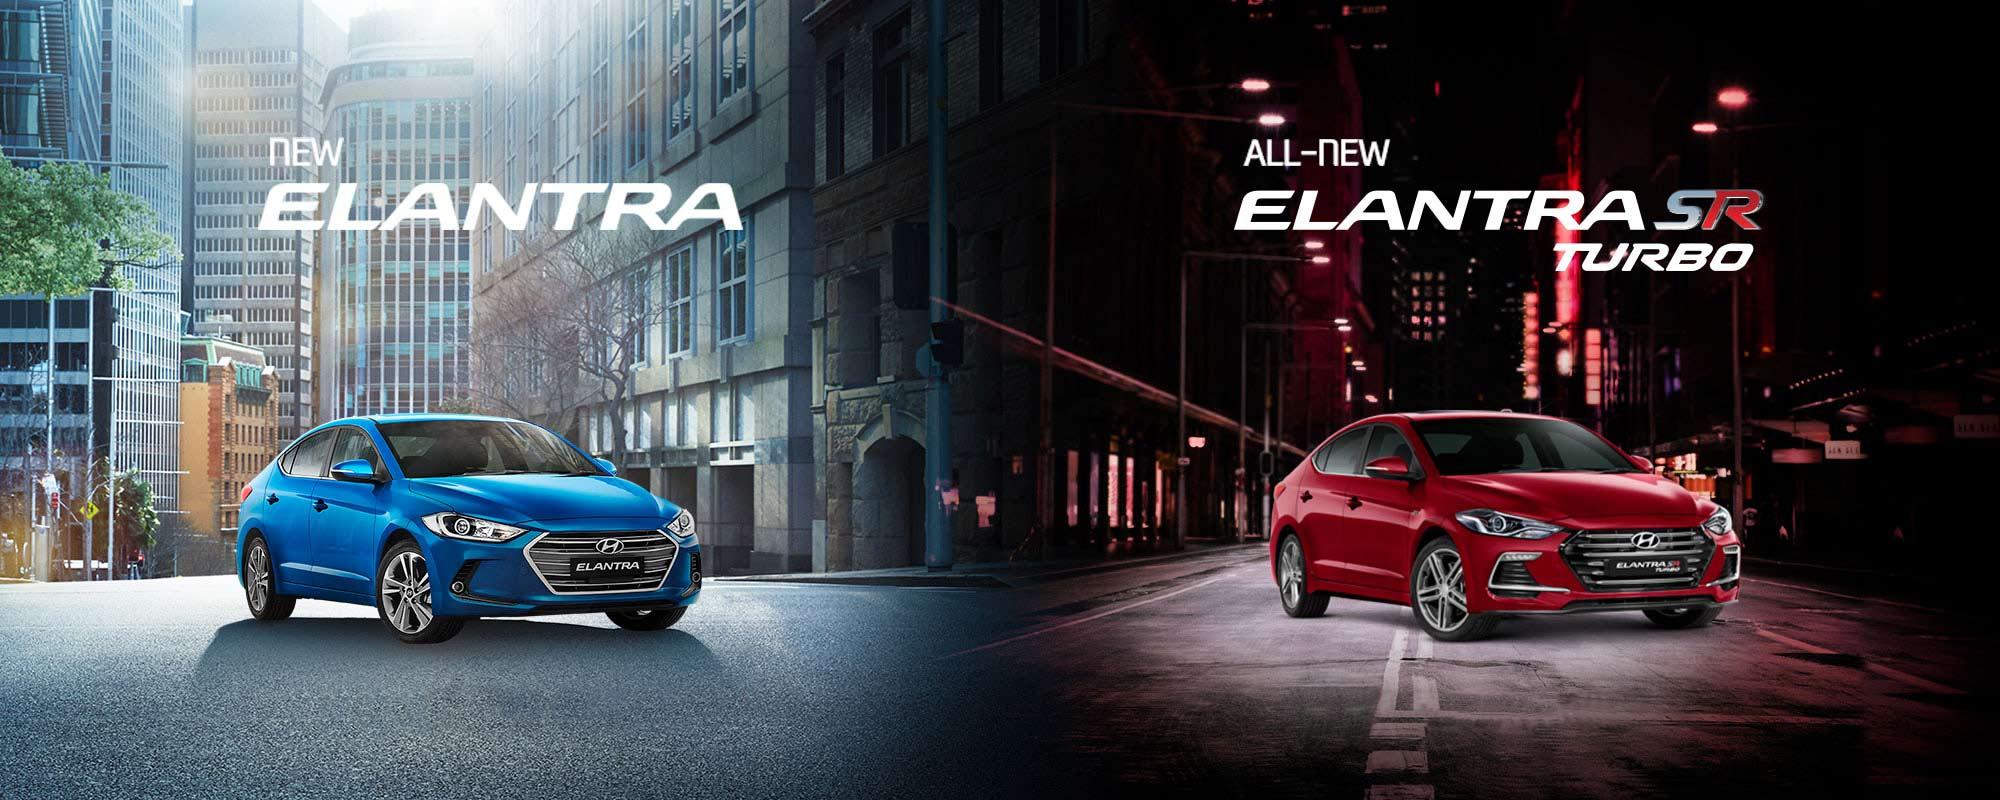 The all new Elantra Sedan and Elantra SR Turbo, now available at Metro Hyundai Brisbane.